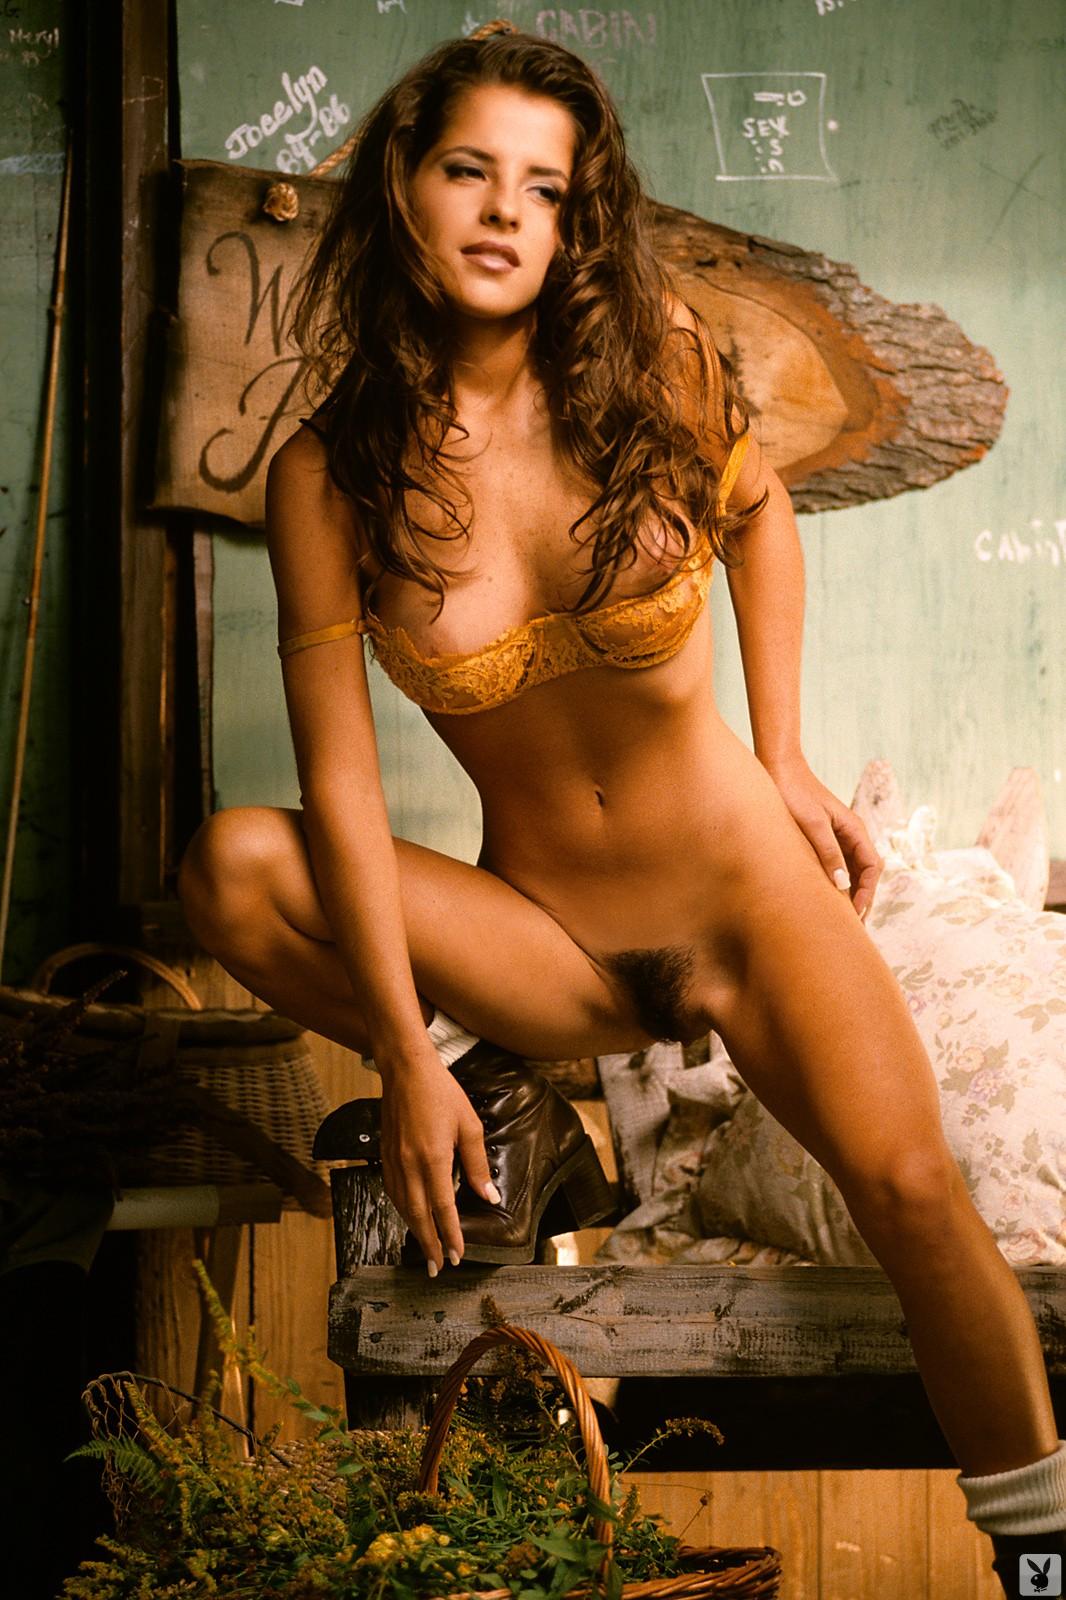 image Kelly monaco nude sex scene in idle hands scandalplanetcom